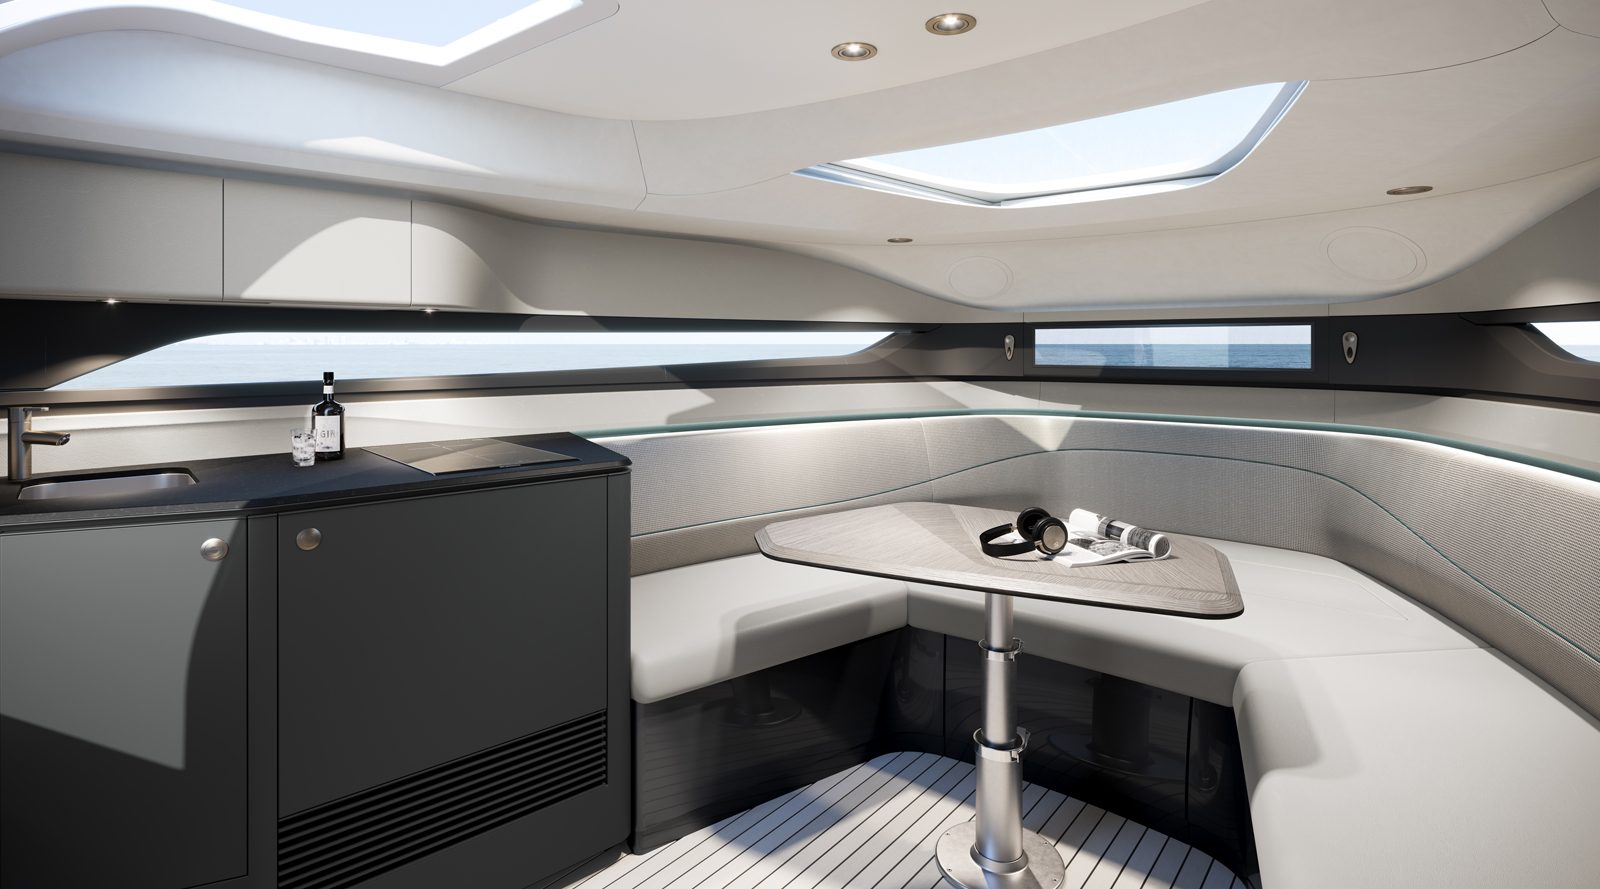 Princess r35 u2013 princess yachts italia u2013 marine group